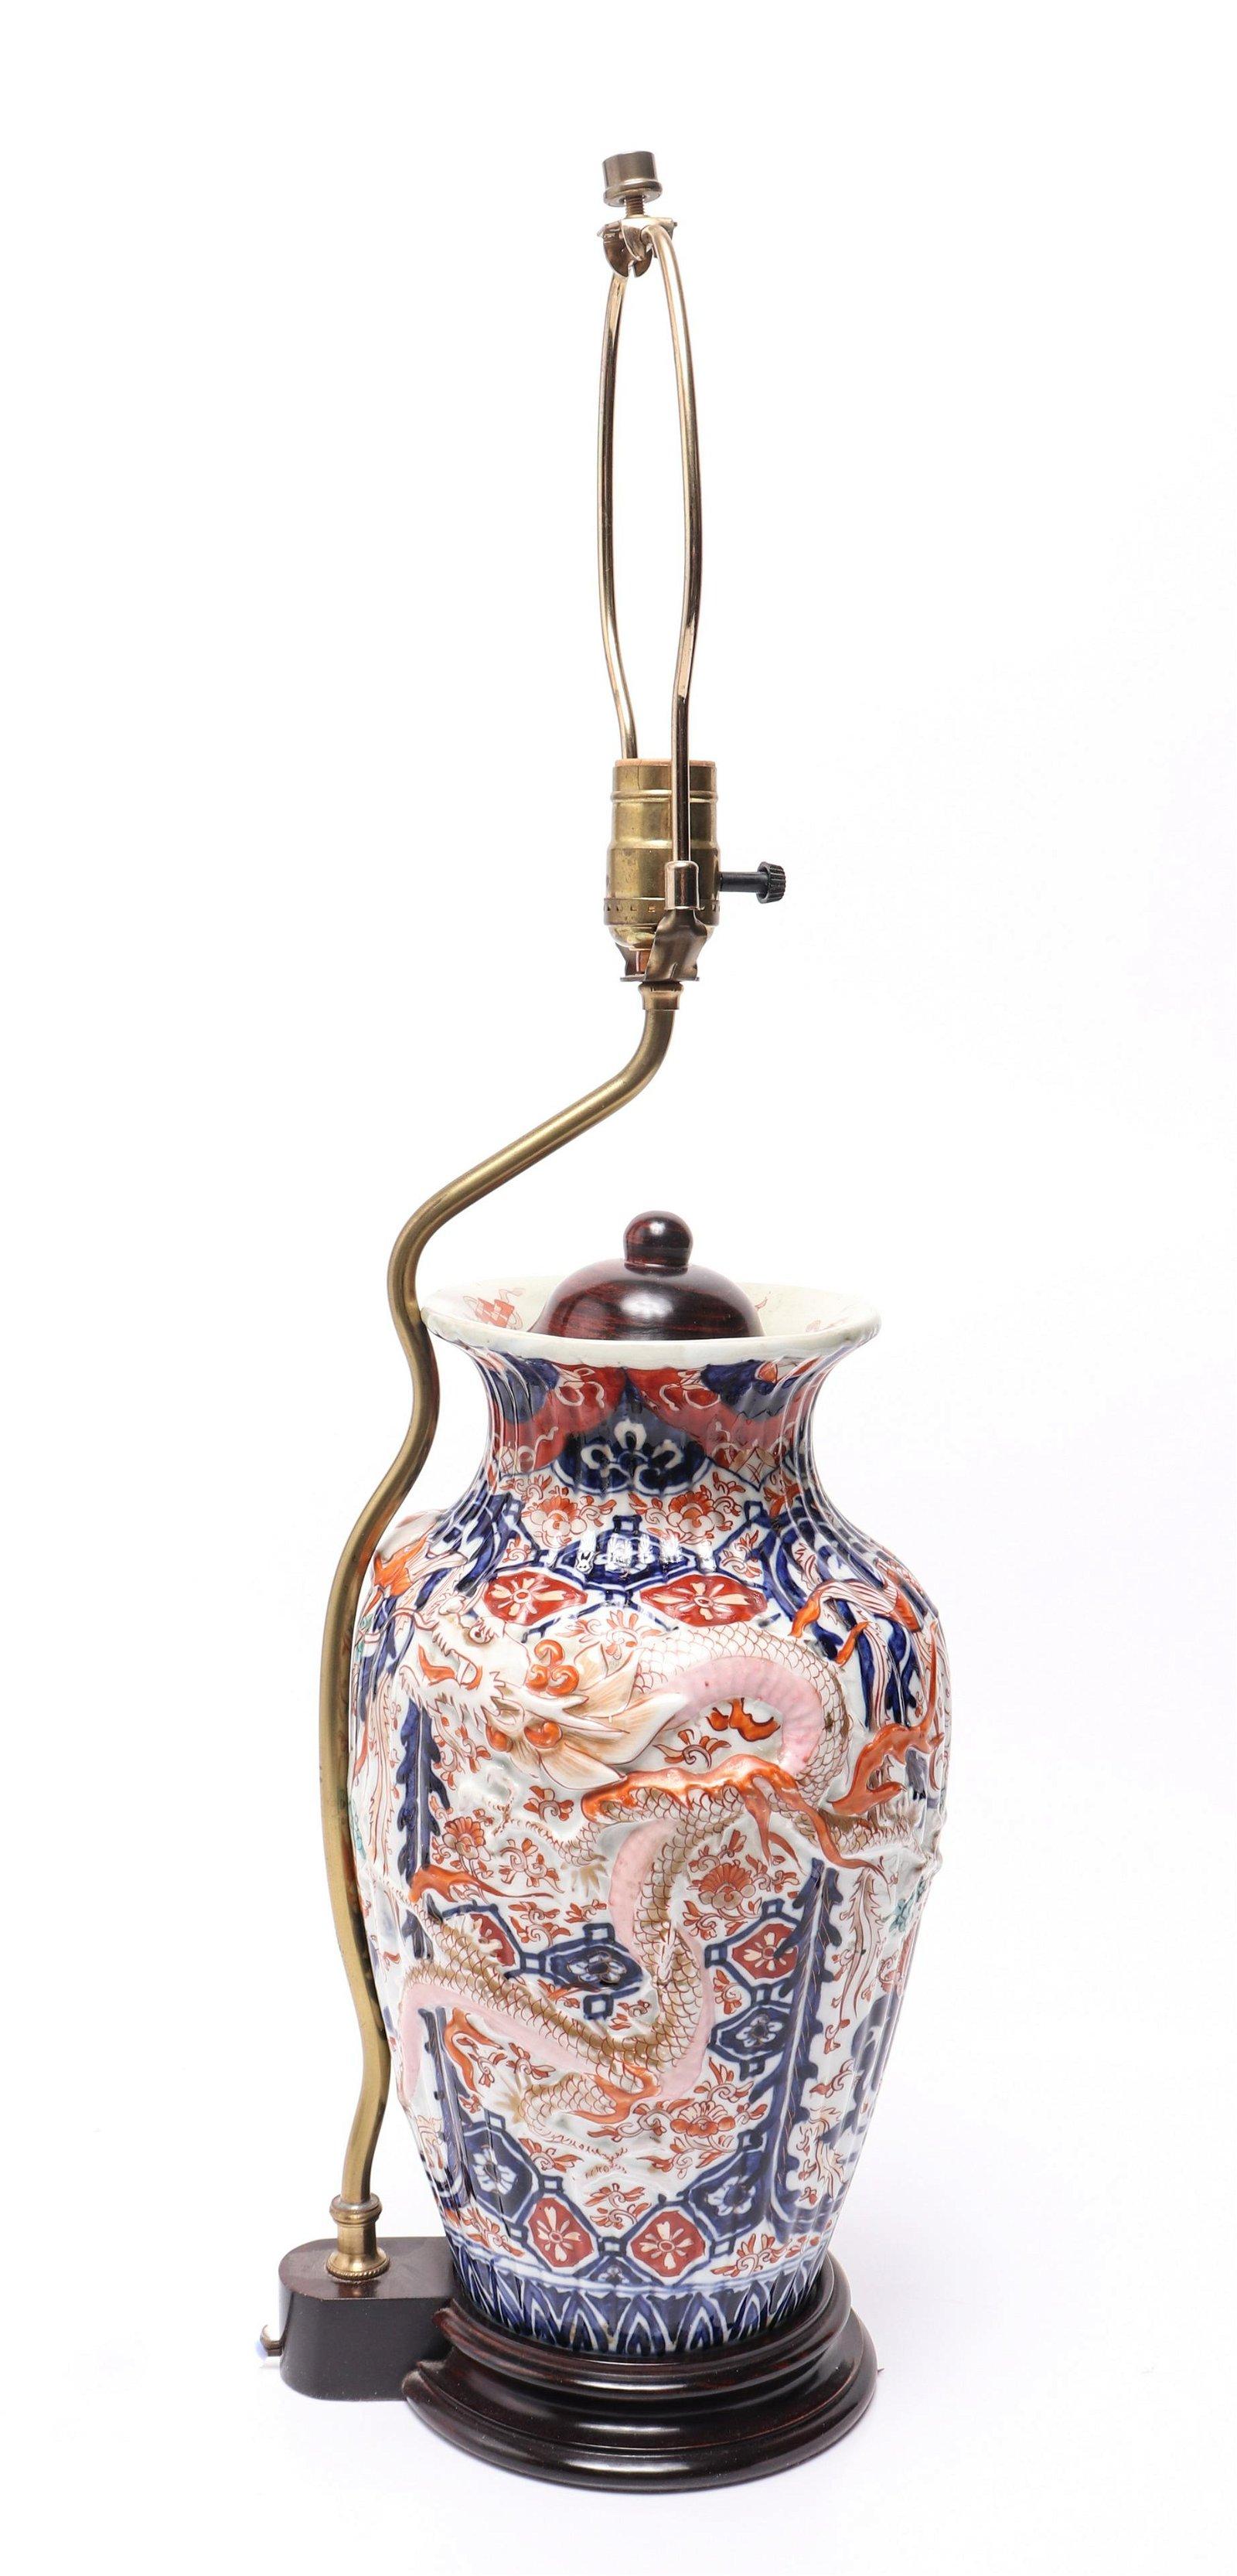 Japanese Imari Porcelain Vase Lamp, 19th C.